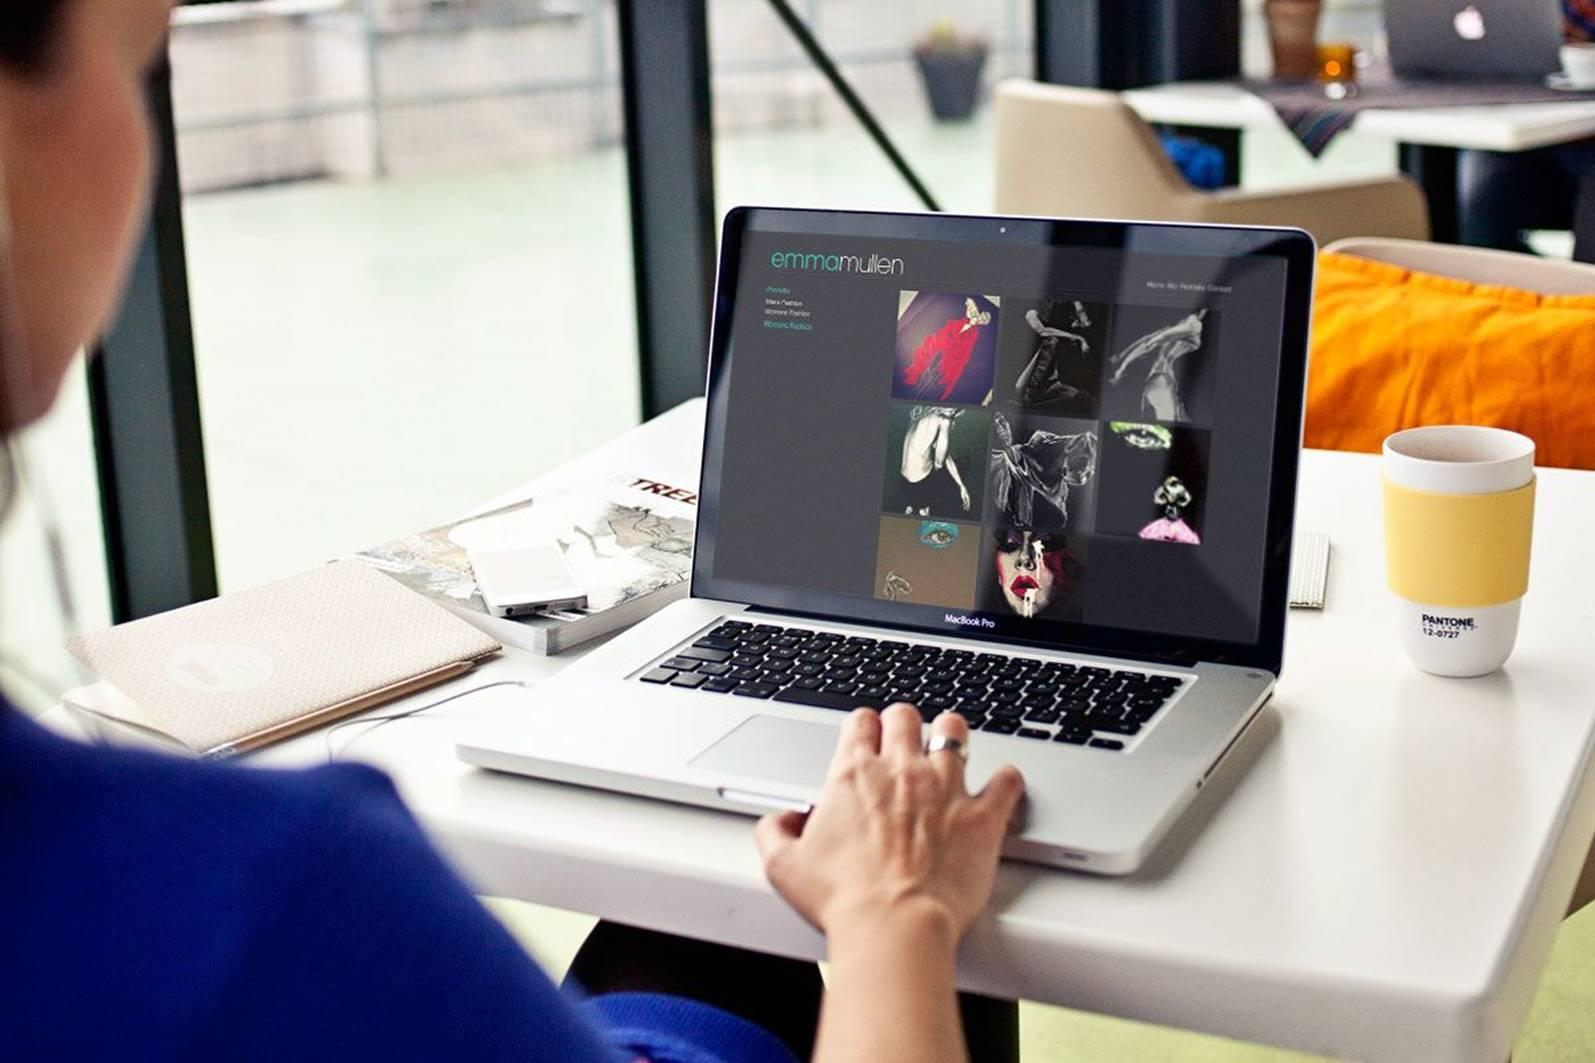 woman typing, white desk, laptop, cup, pencil, orange cushion